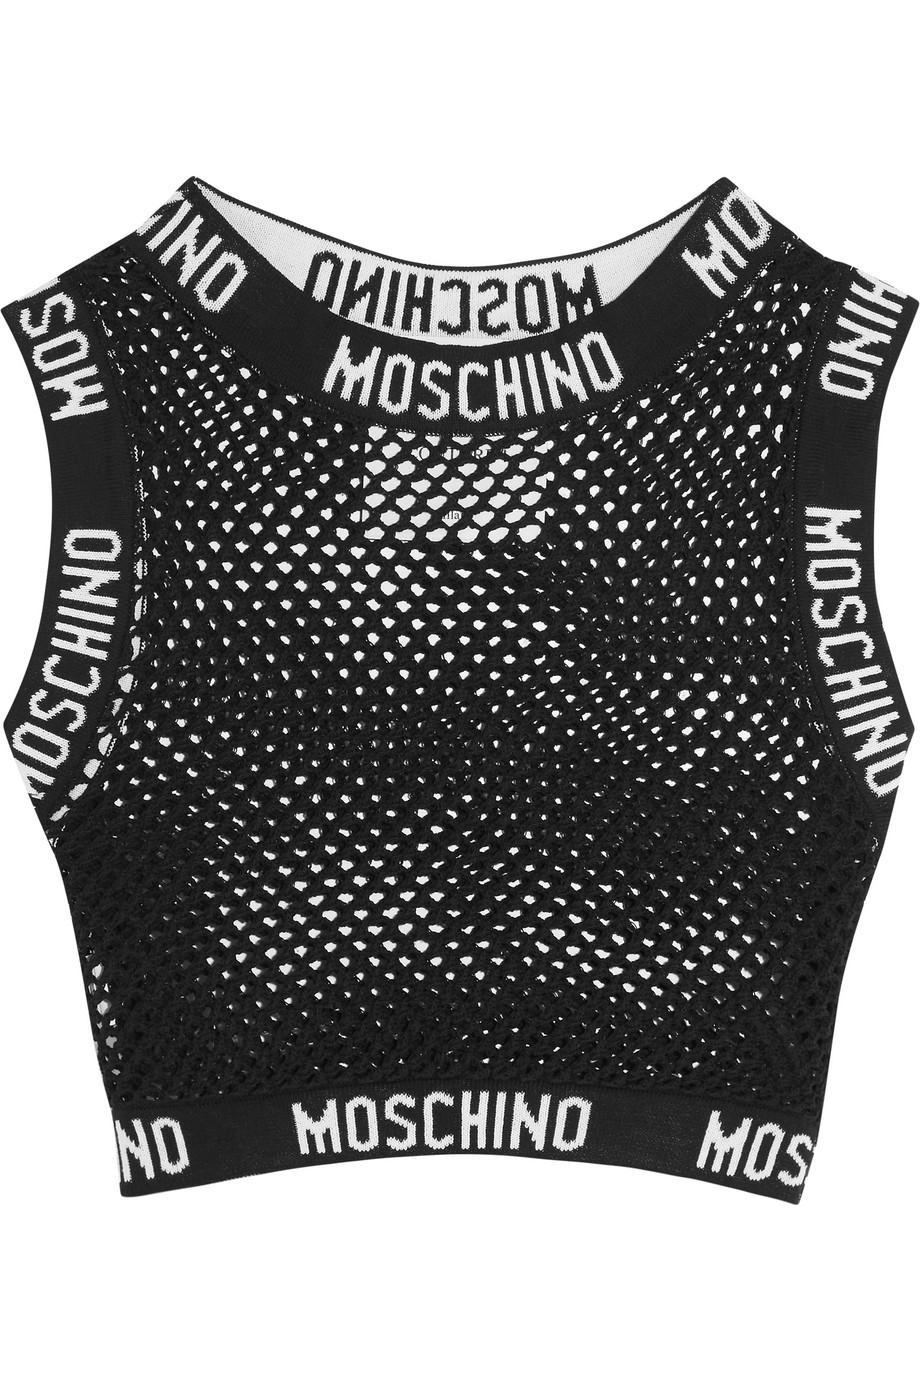 Moschino Cropped Cotton-Mesh Top, Black, Women's, Size: 44